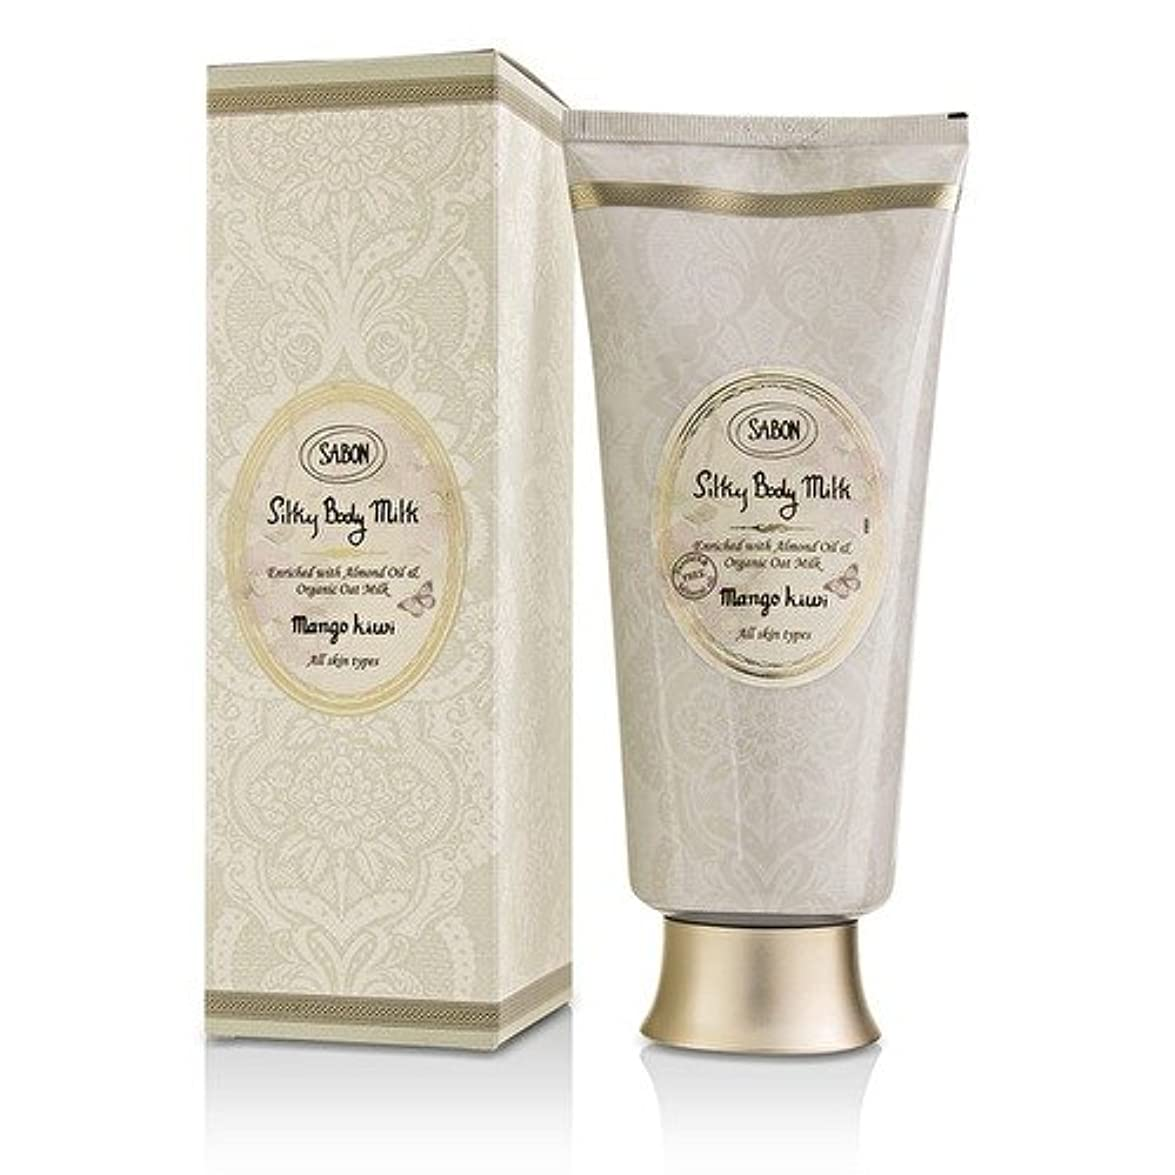 サボン Silky Body Milk - Mango Kiwi 200ml/7oz並行輸入品